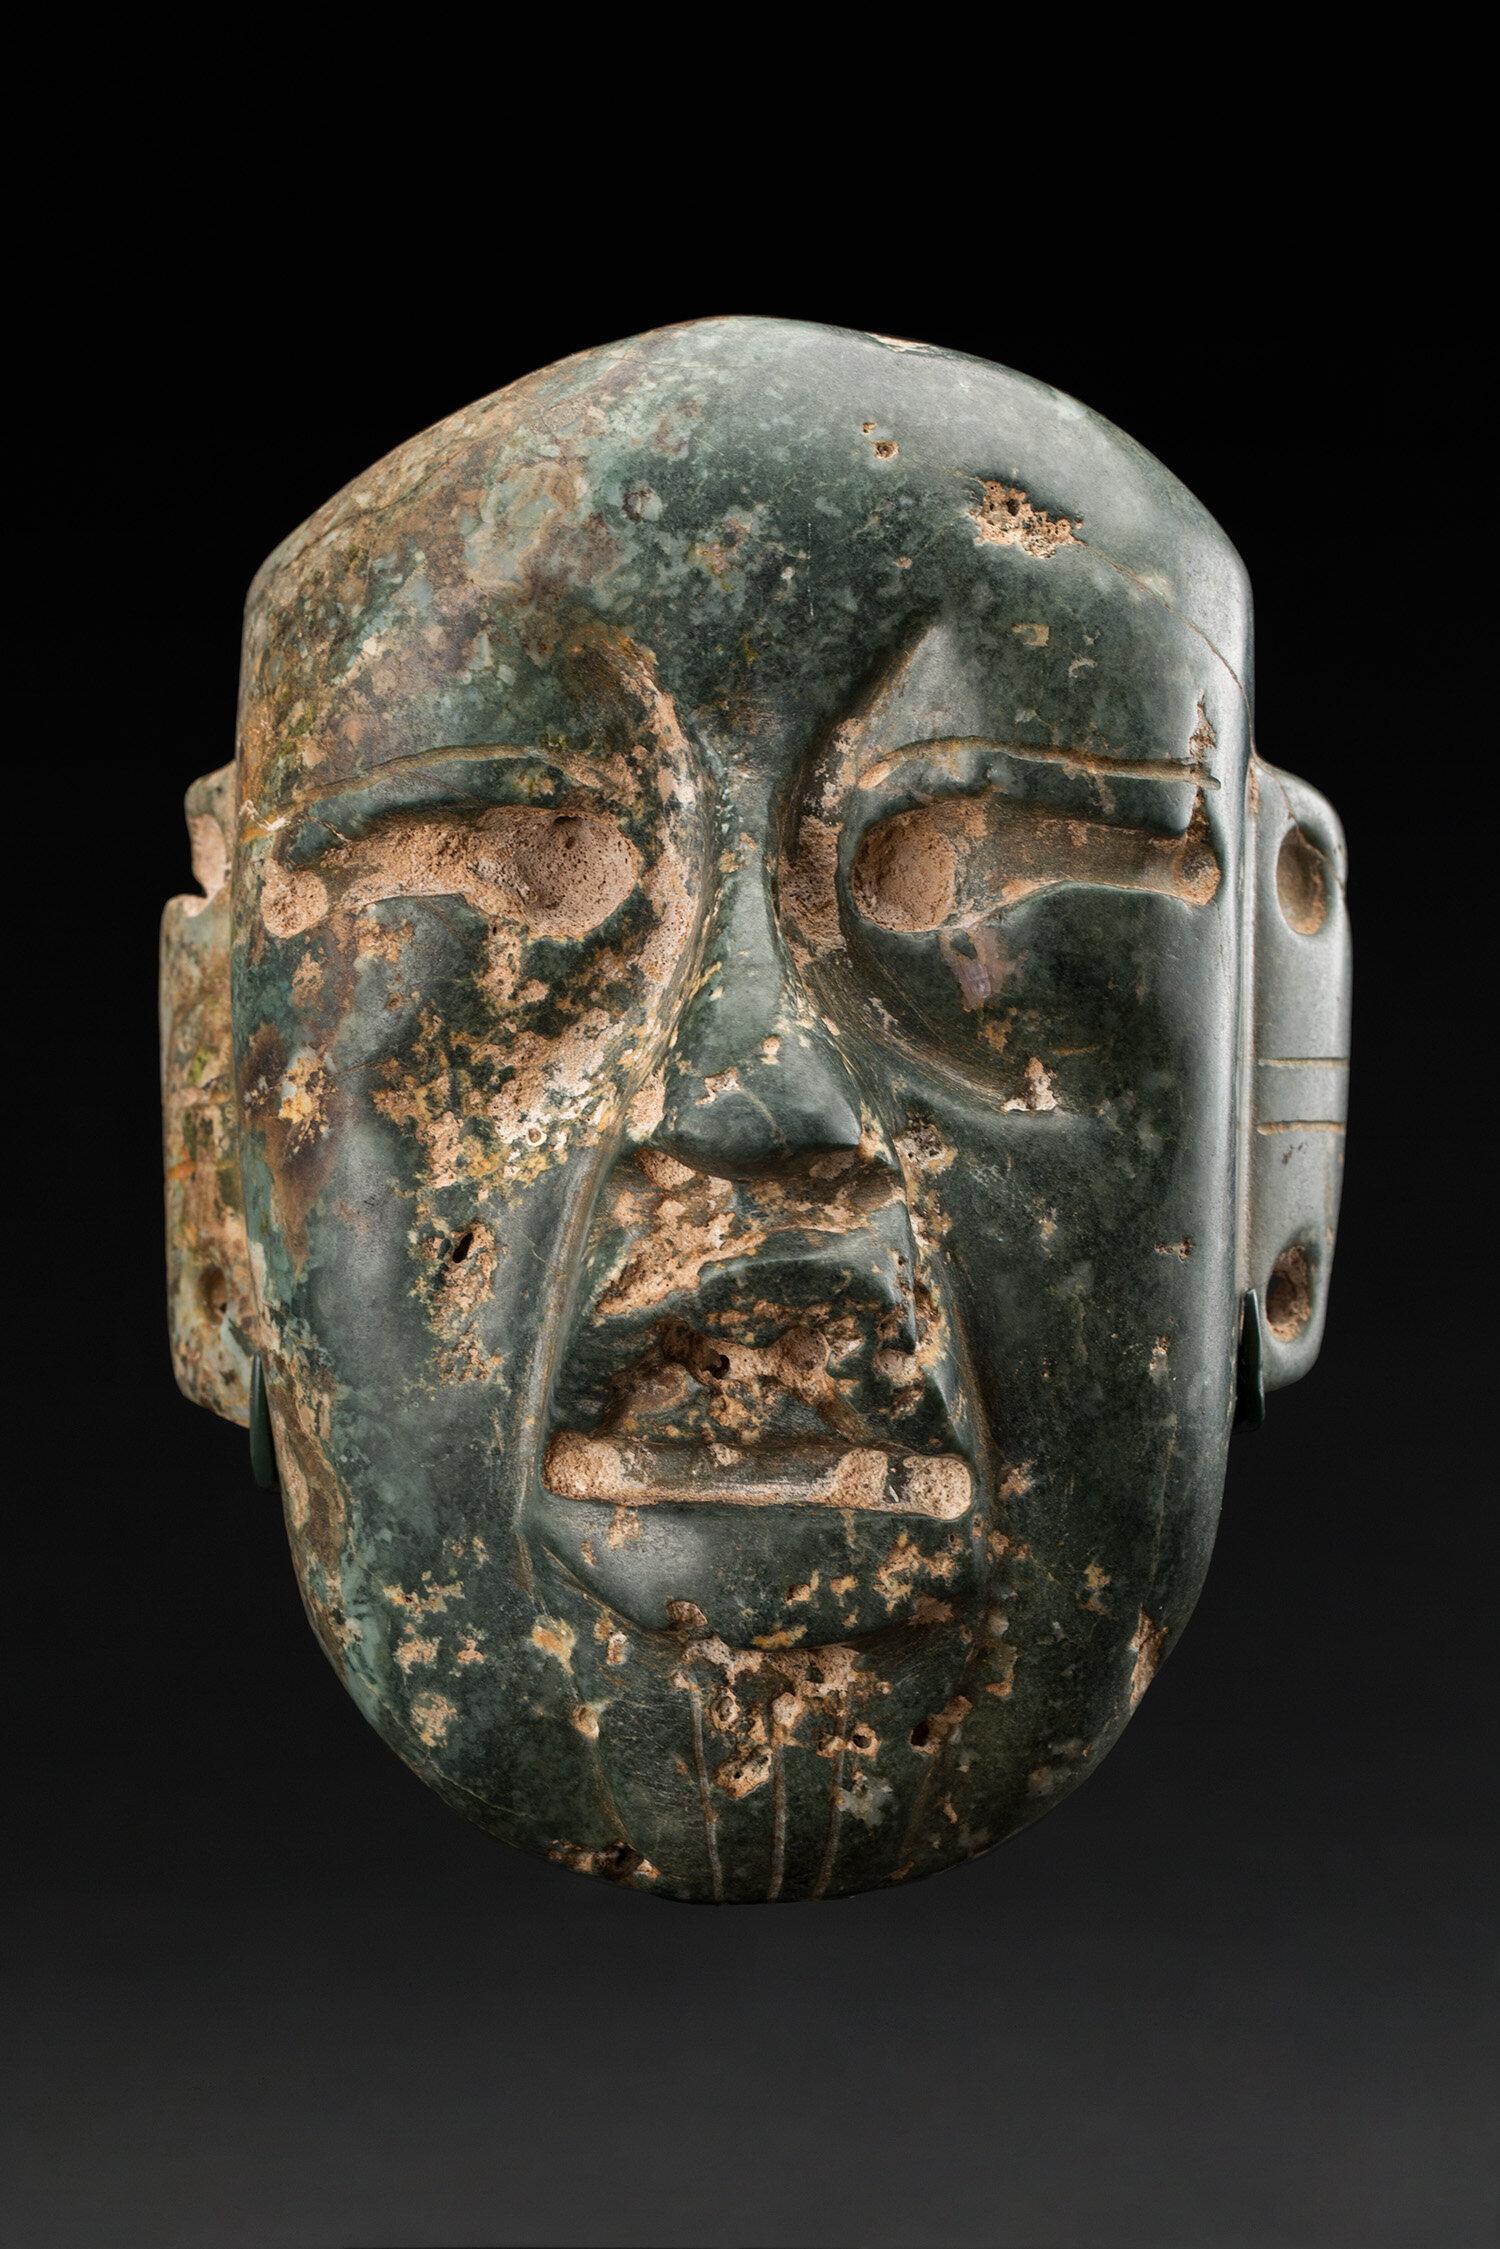 Masks  Olmec  , 1100-500 BCE Jade 5.25 x 4 x 2.5 inches 13.3 x 10.2 x 6.4 cm M 413